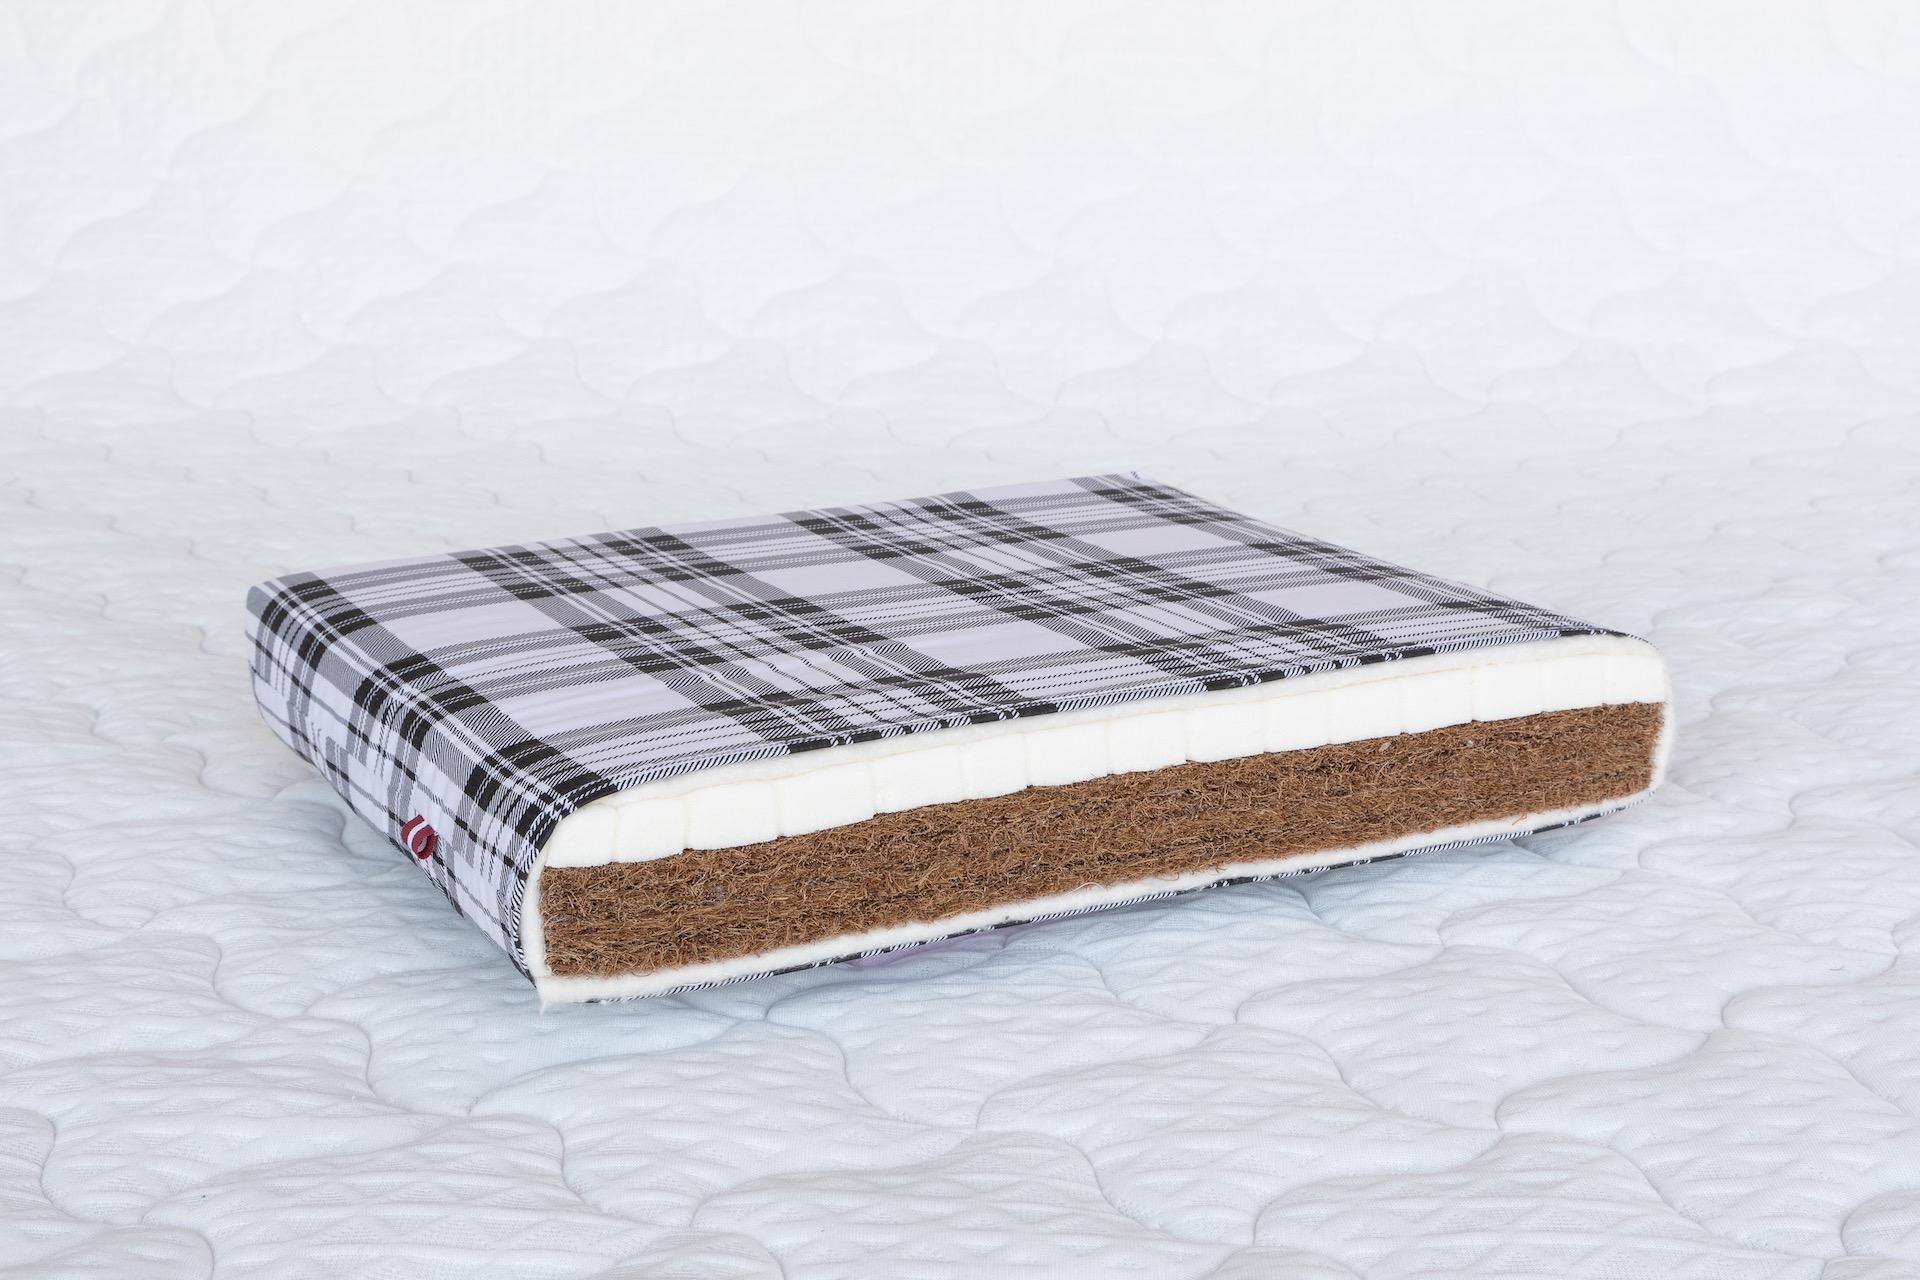 relat.lv-matracis-Bērnu matracis KokossLatekss 6 cm